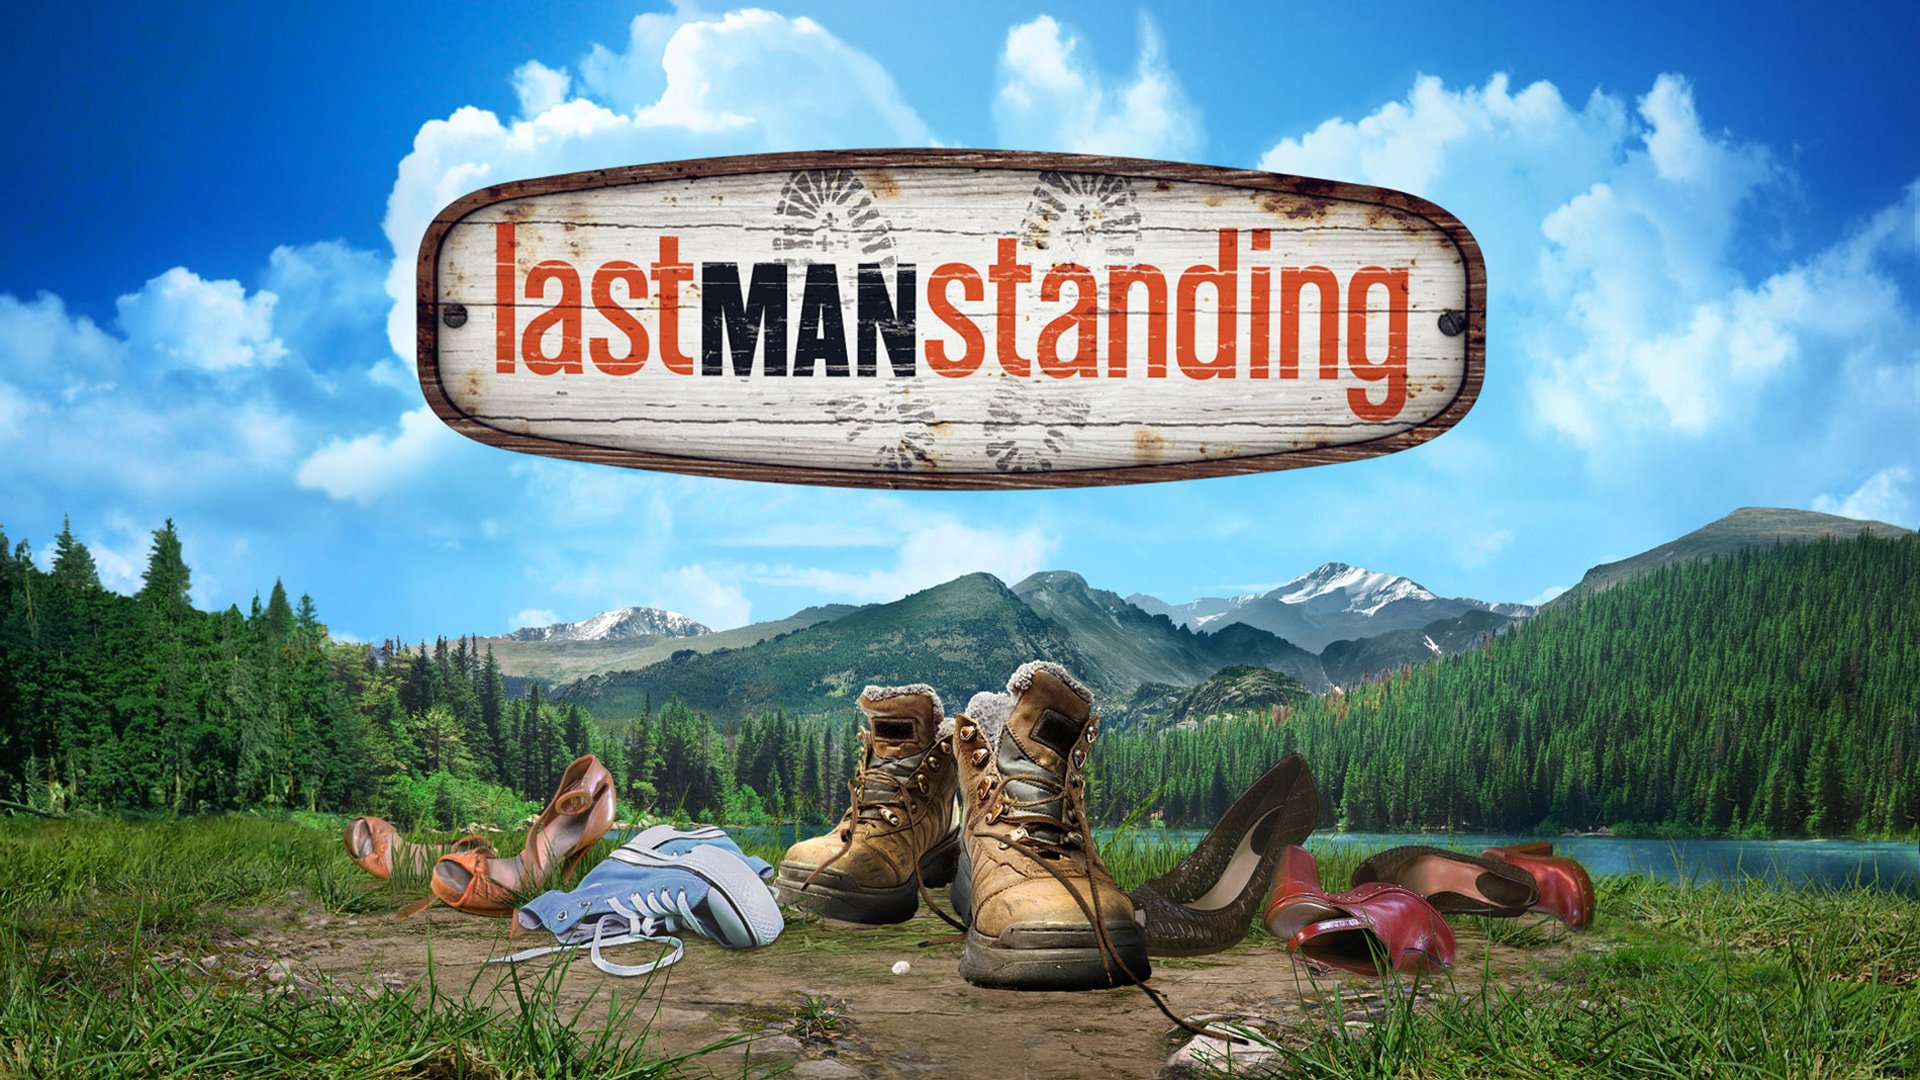 Last Man Standing HD Wallpaper Background Image 1920x1080 ID 1920x1080